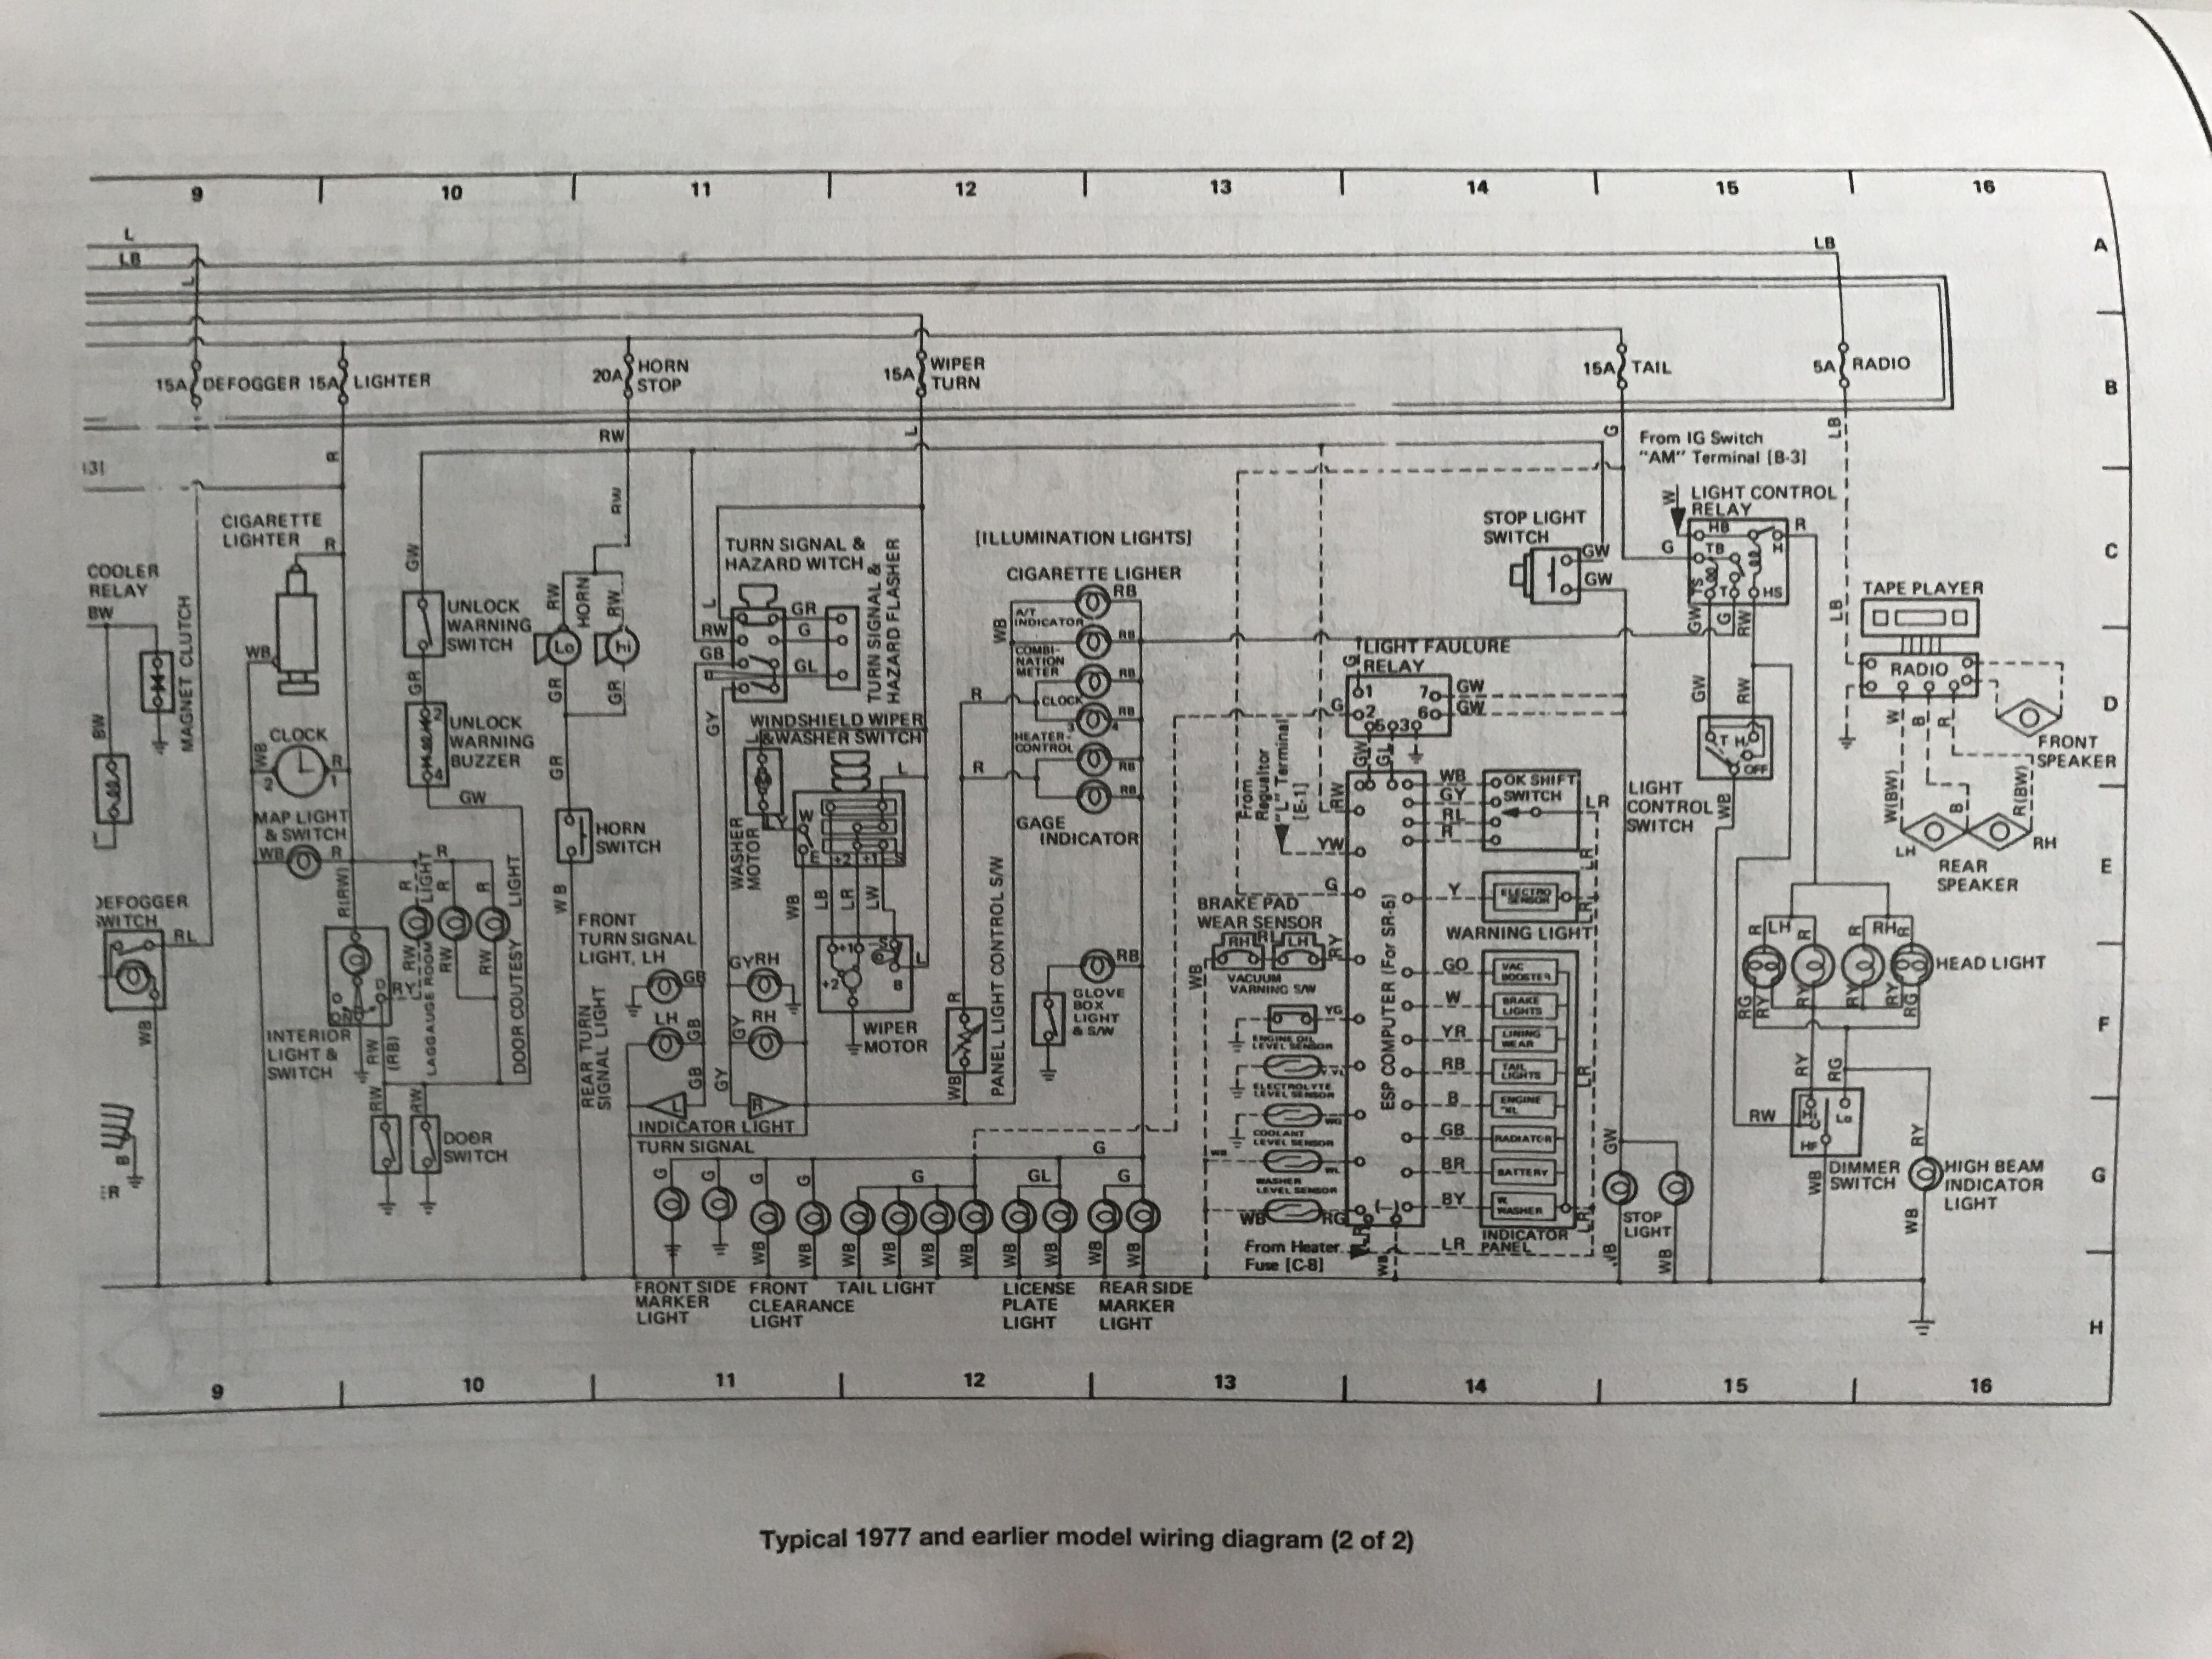 Pleasant Celica Wiring Diagram Wiring Diagram Wiring Cloud Itislusmarecoveryedborg